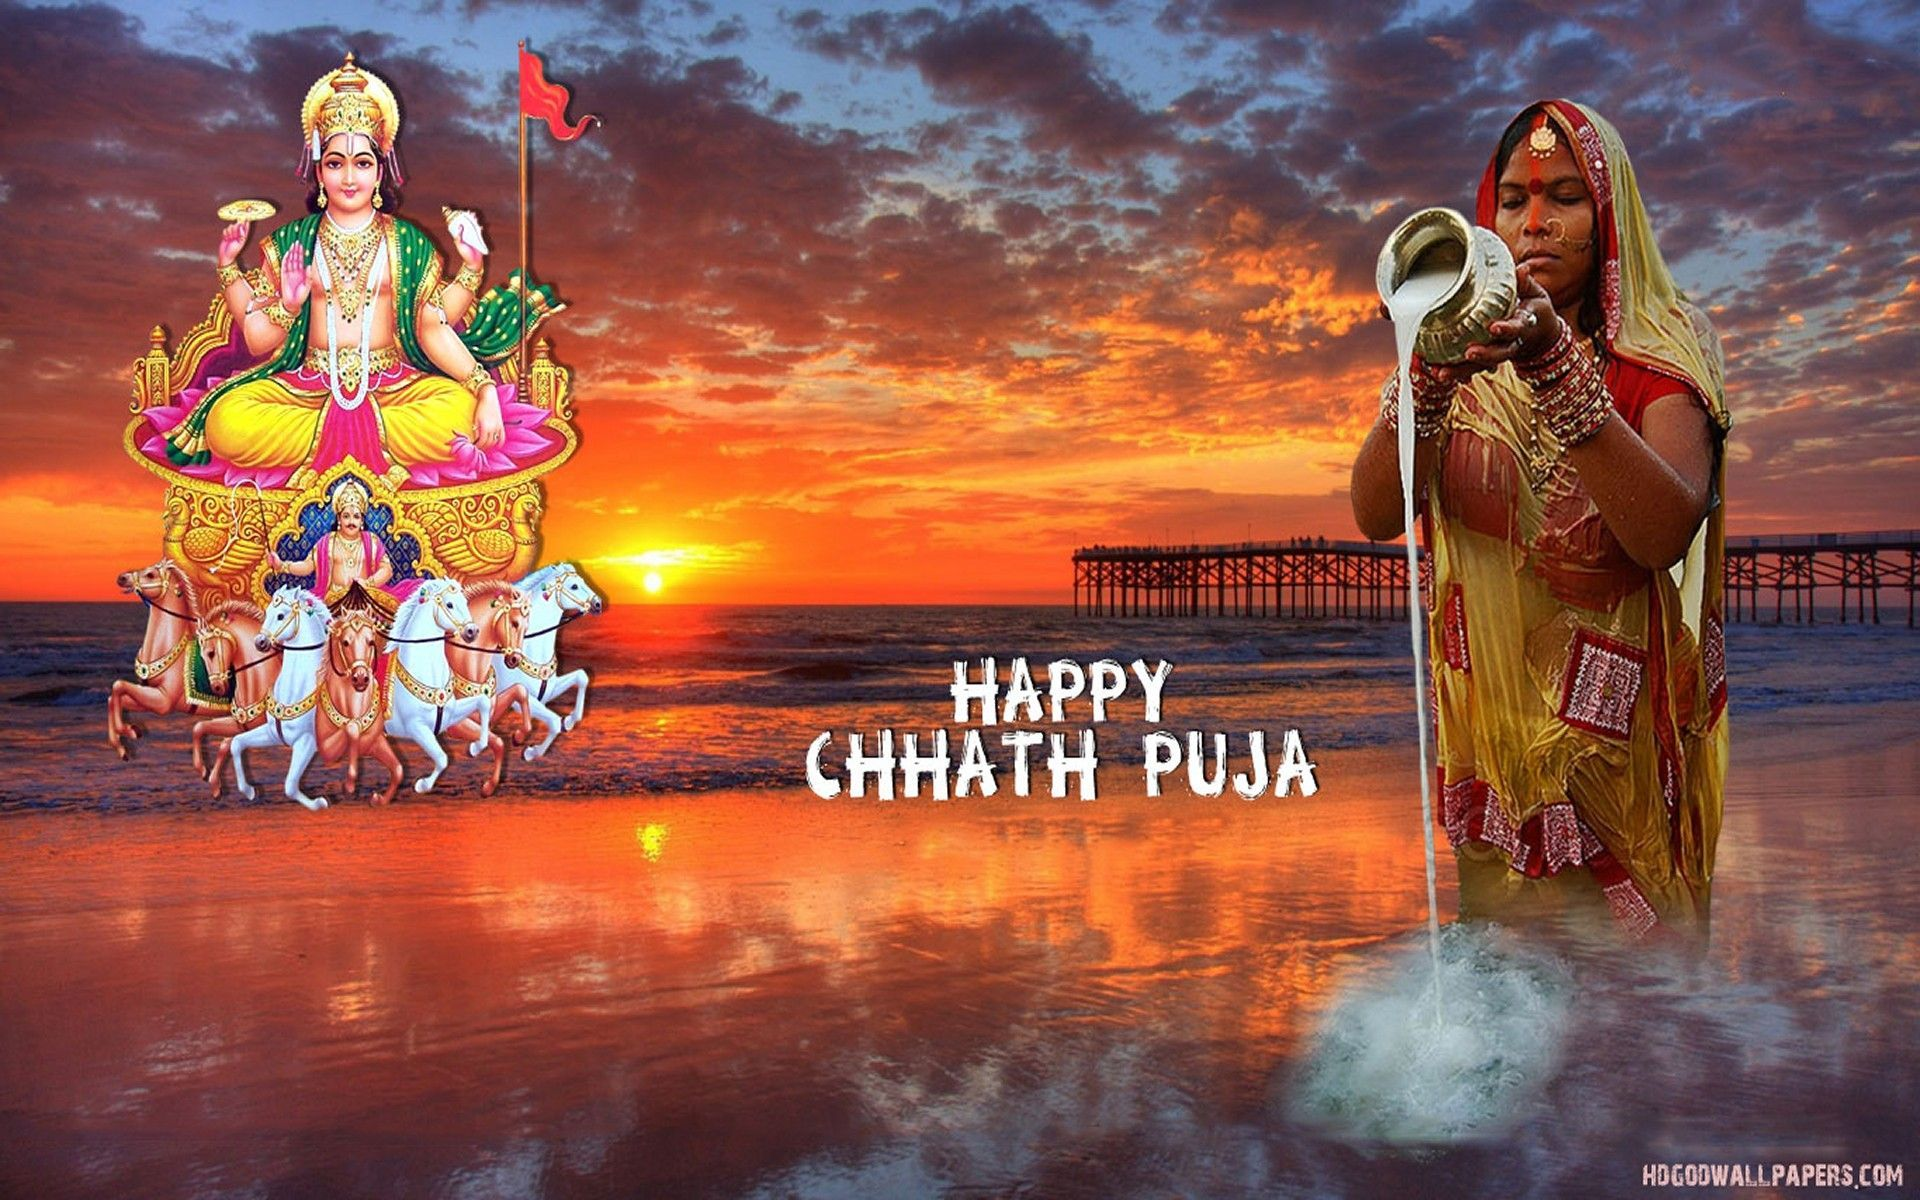 Pin by Hayagi on Ads   Happy chhath puja, Wallpaper free ...